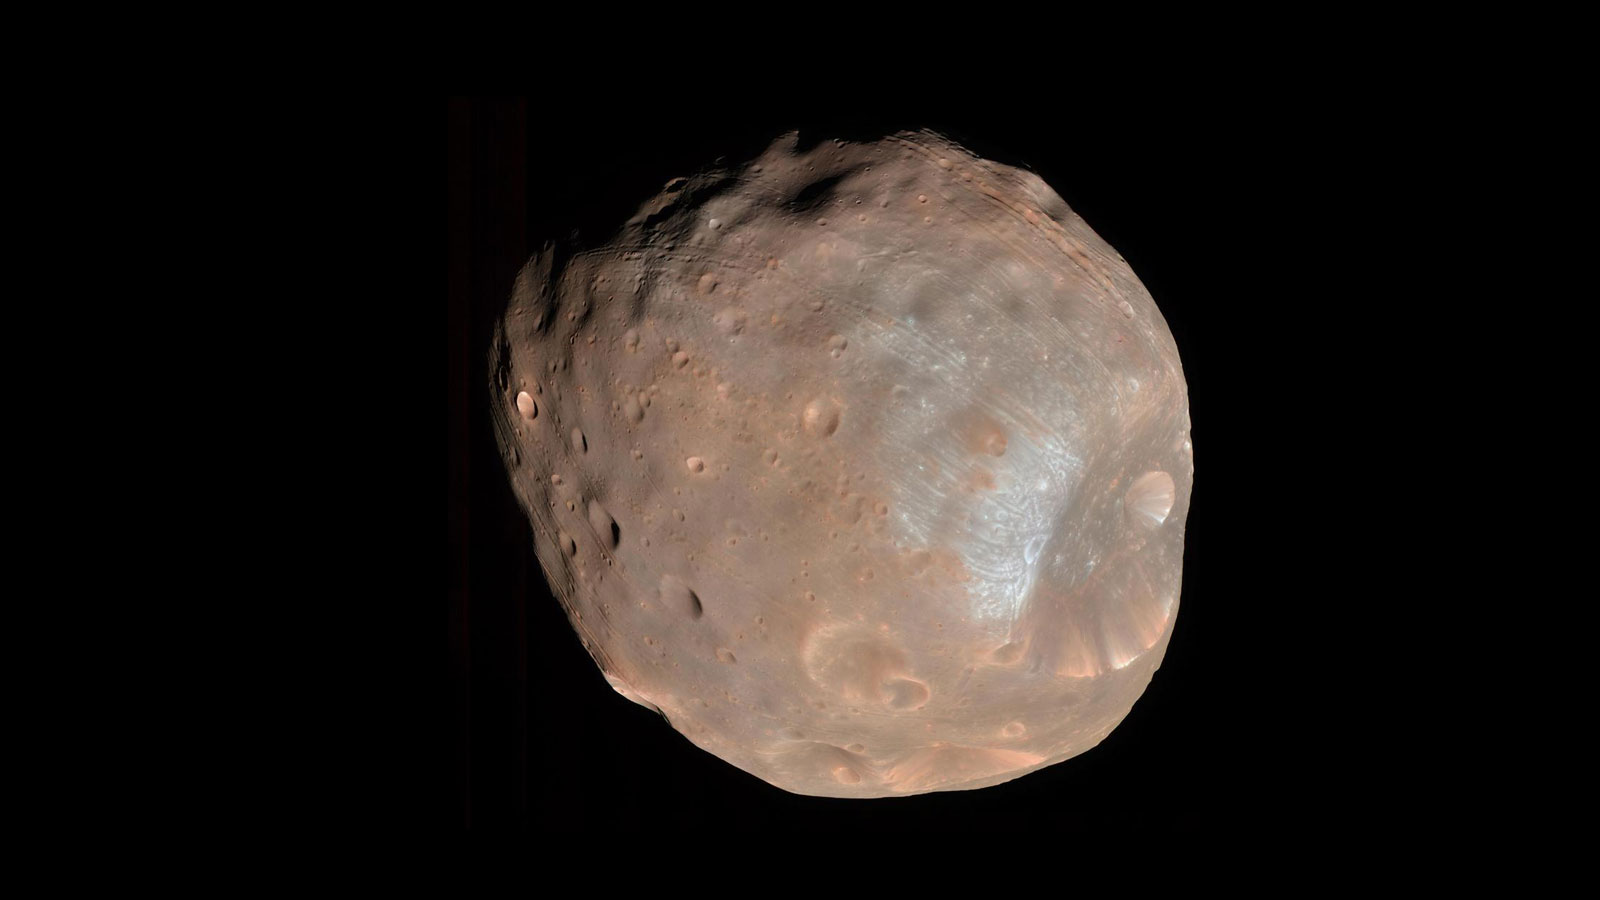 Phobos Facts - Mar's Moon